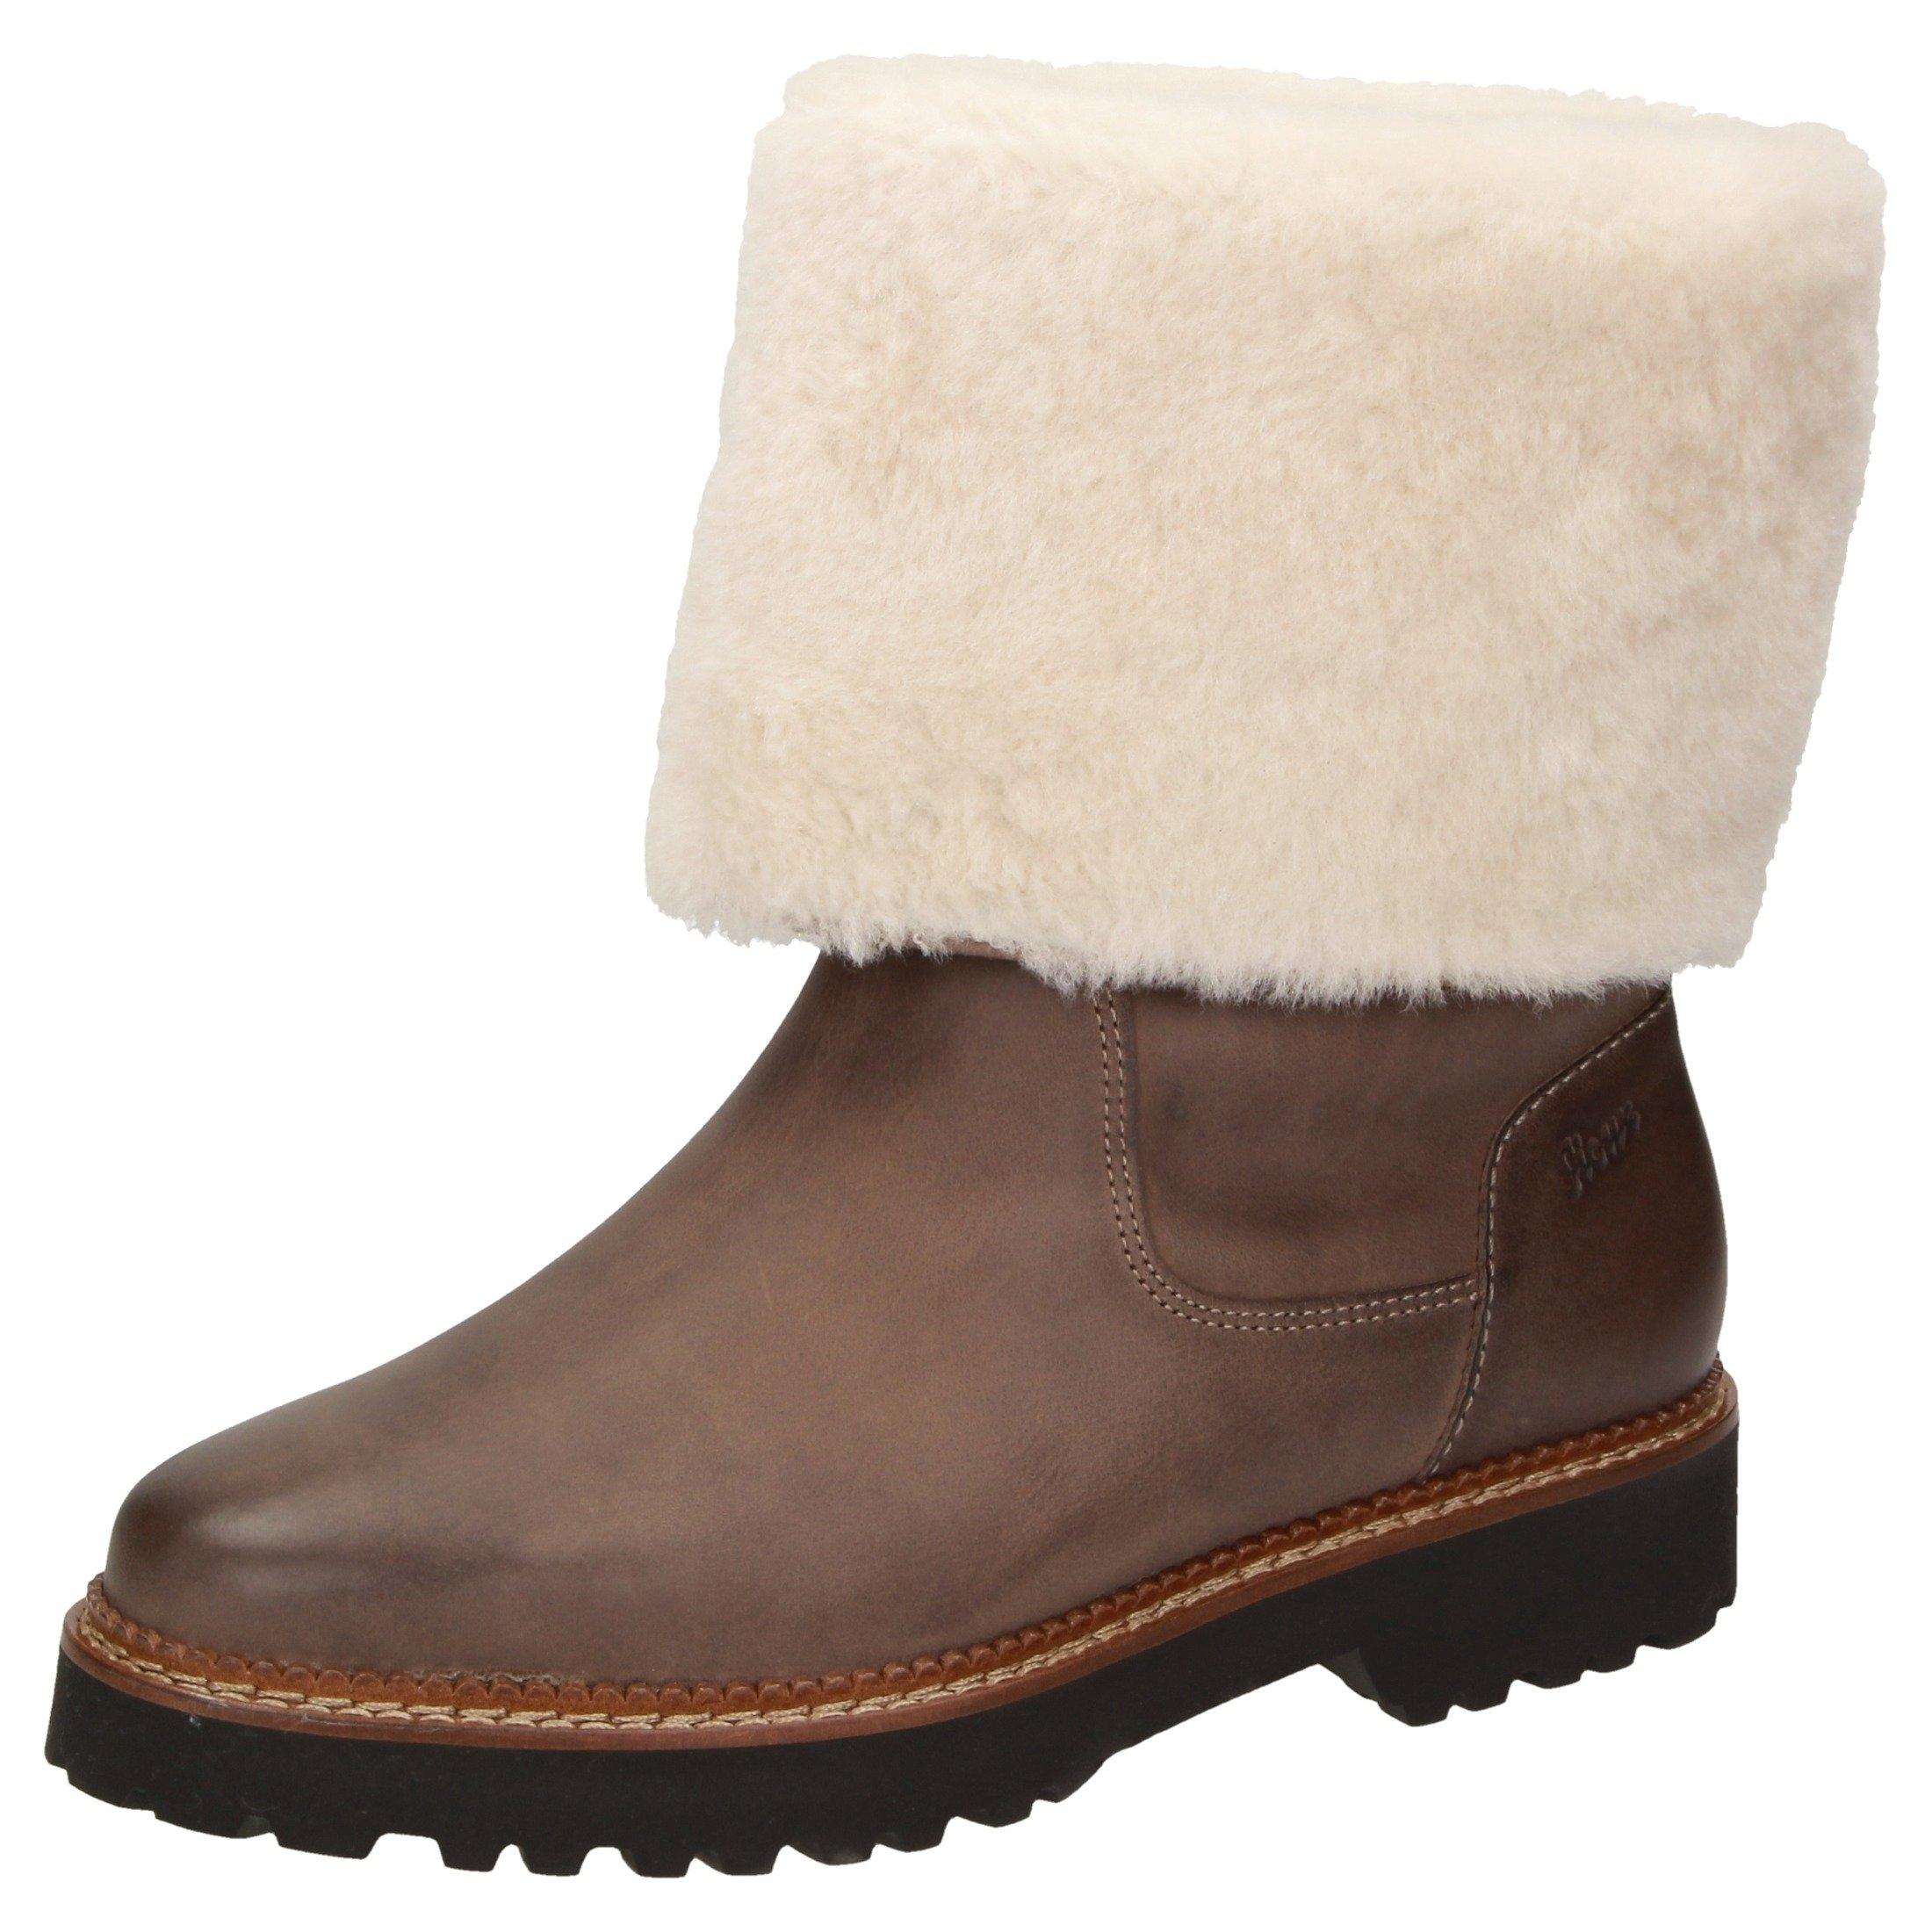 Sioux laarzen »Velma-LF« goedkoop op otto.nl kopen